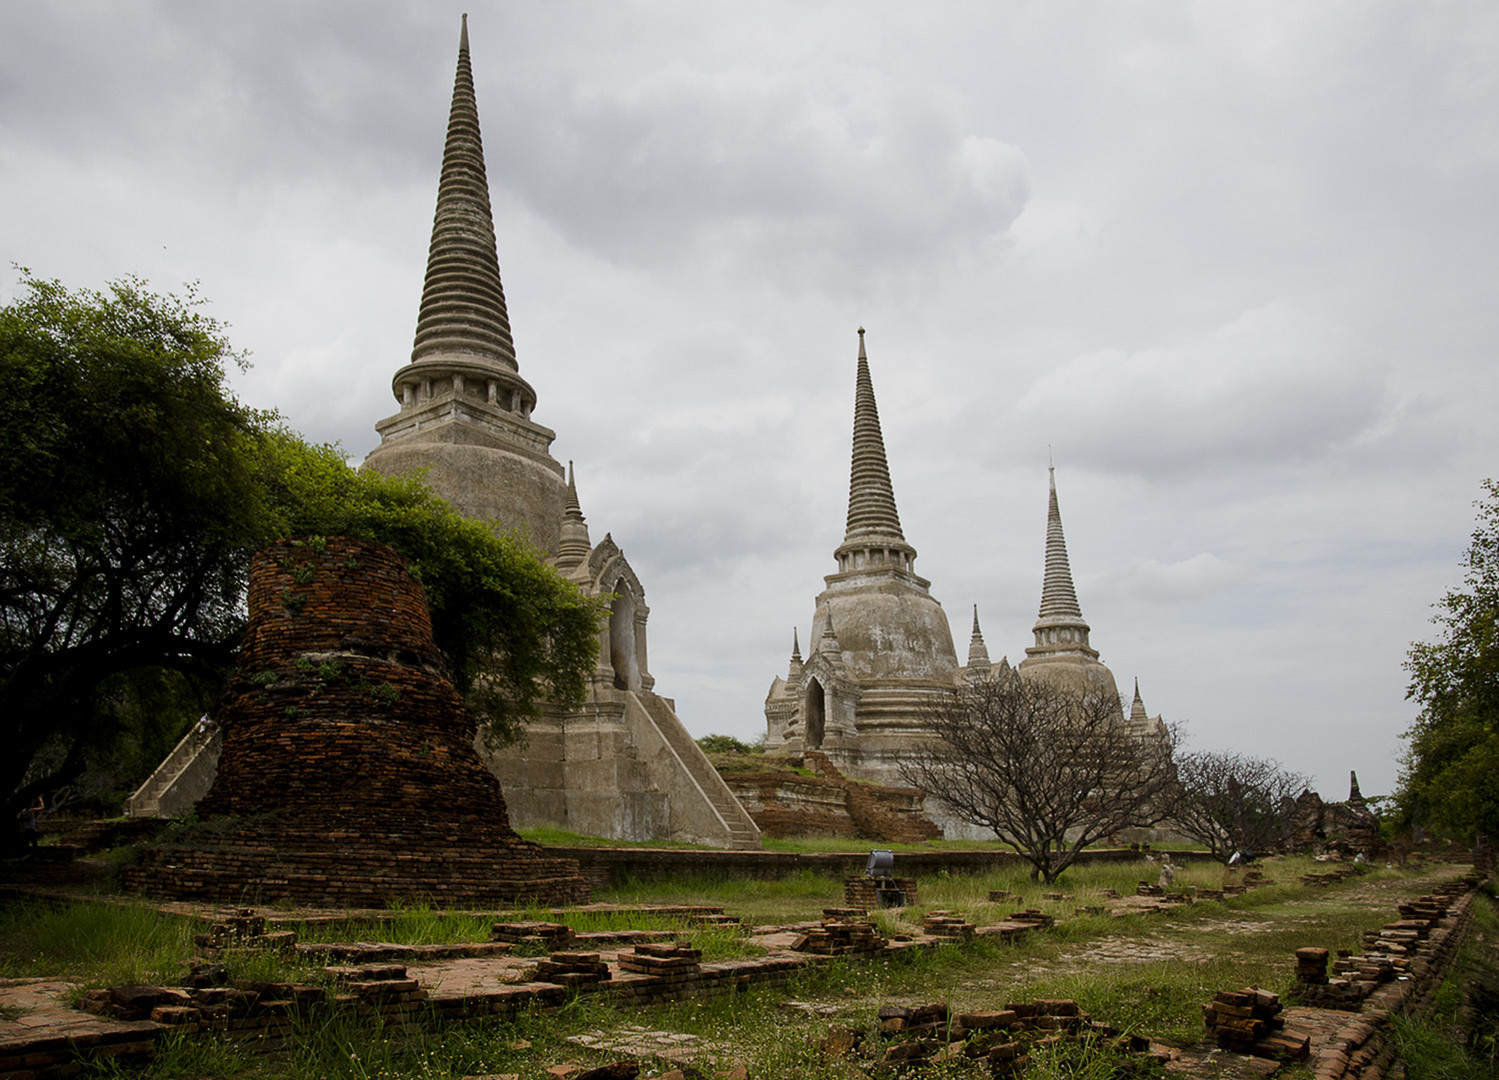 Ayuttaya-Wat Phra Si Samphet